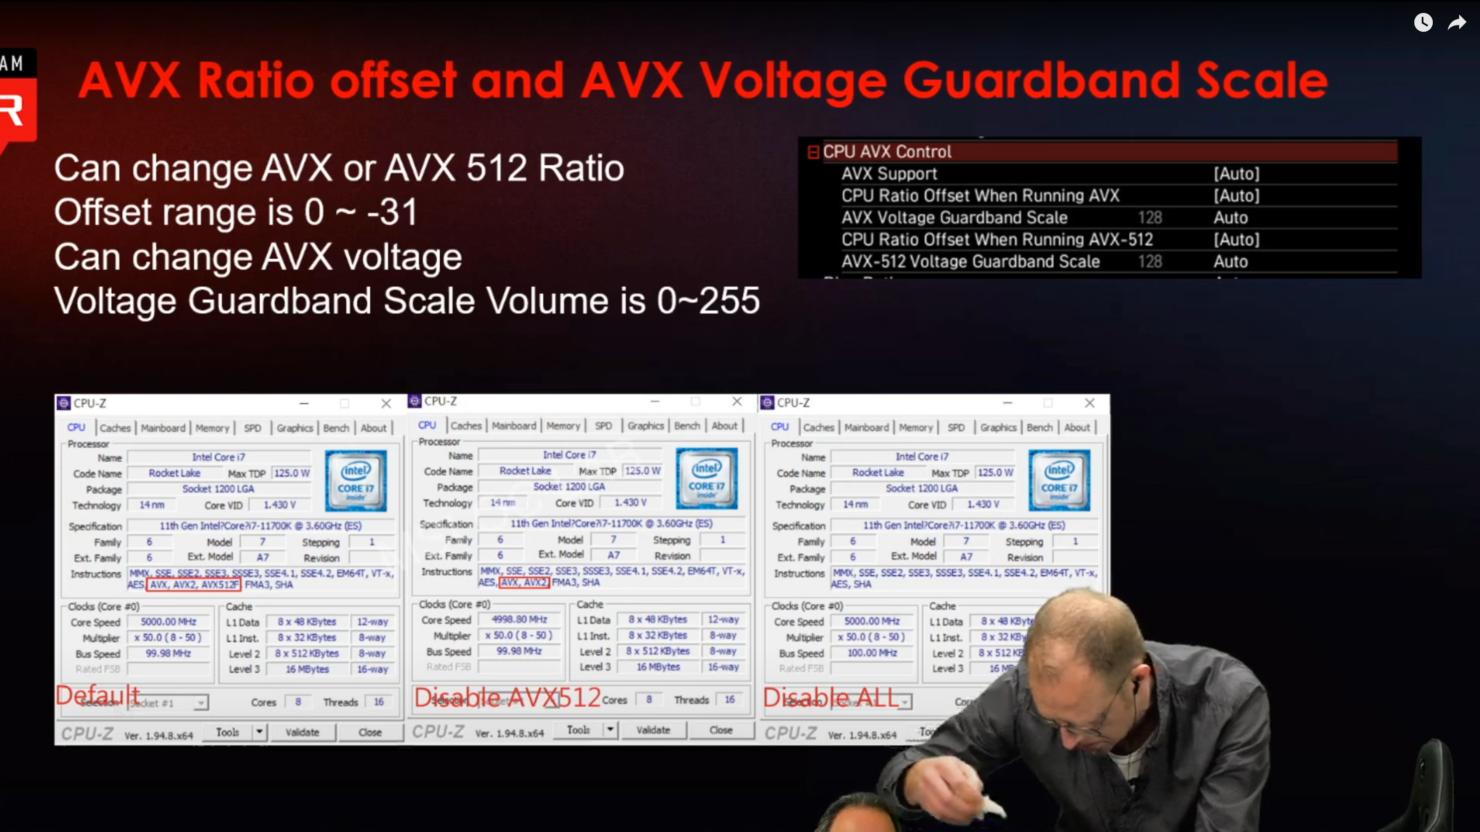 msi-intel-11th-gen-rocket-lake-desktop-cpu-overclocking-power-limits-temperatures-adaptive-boost-technology-gear-modes-detailed-_4